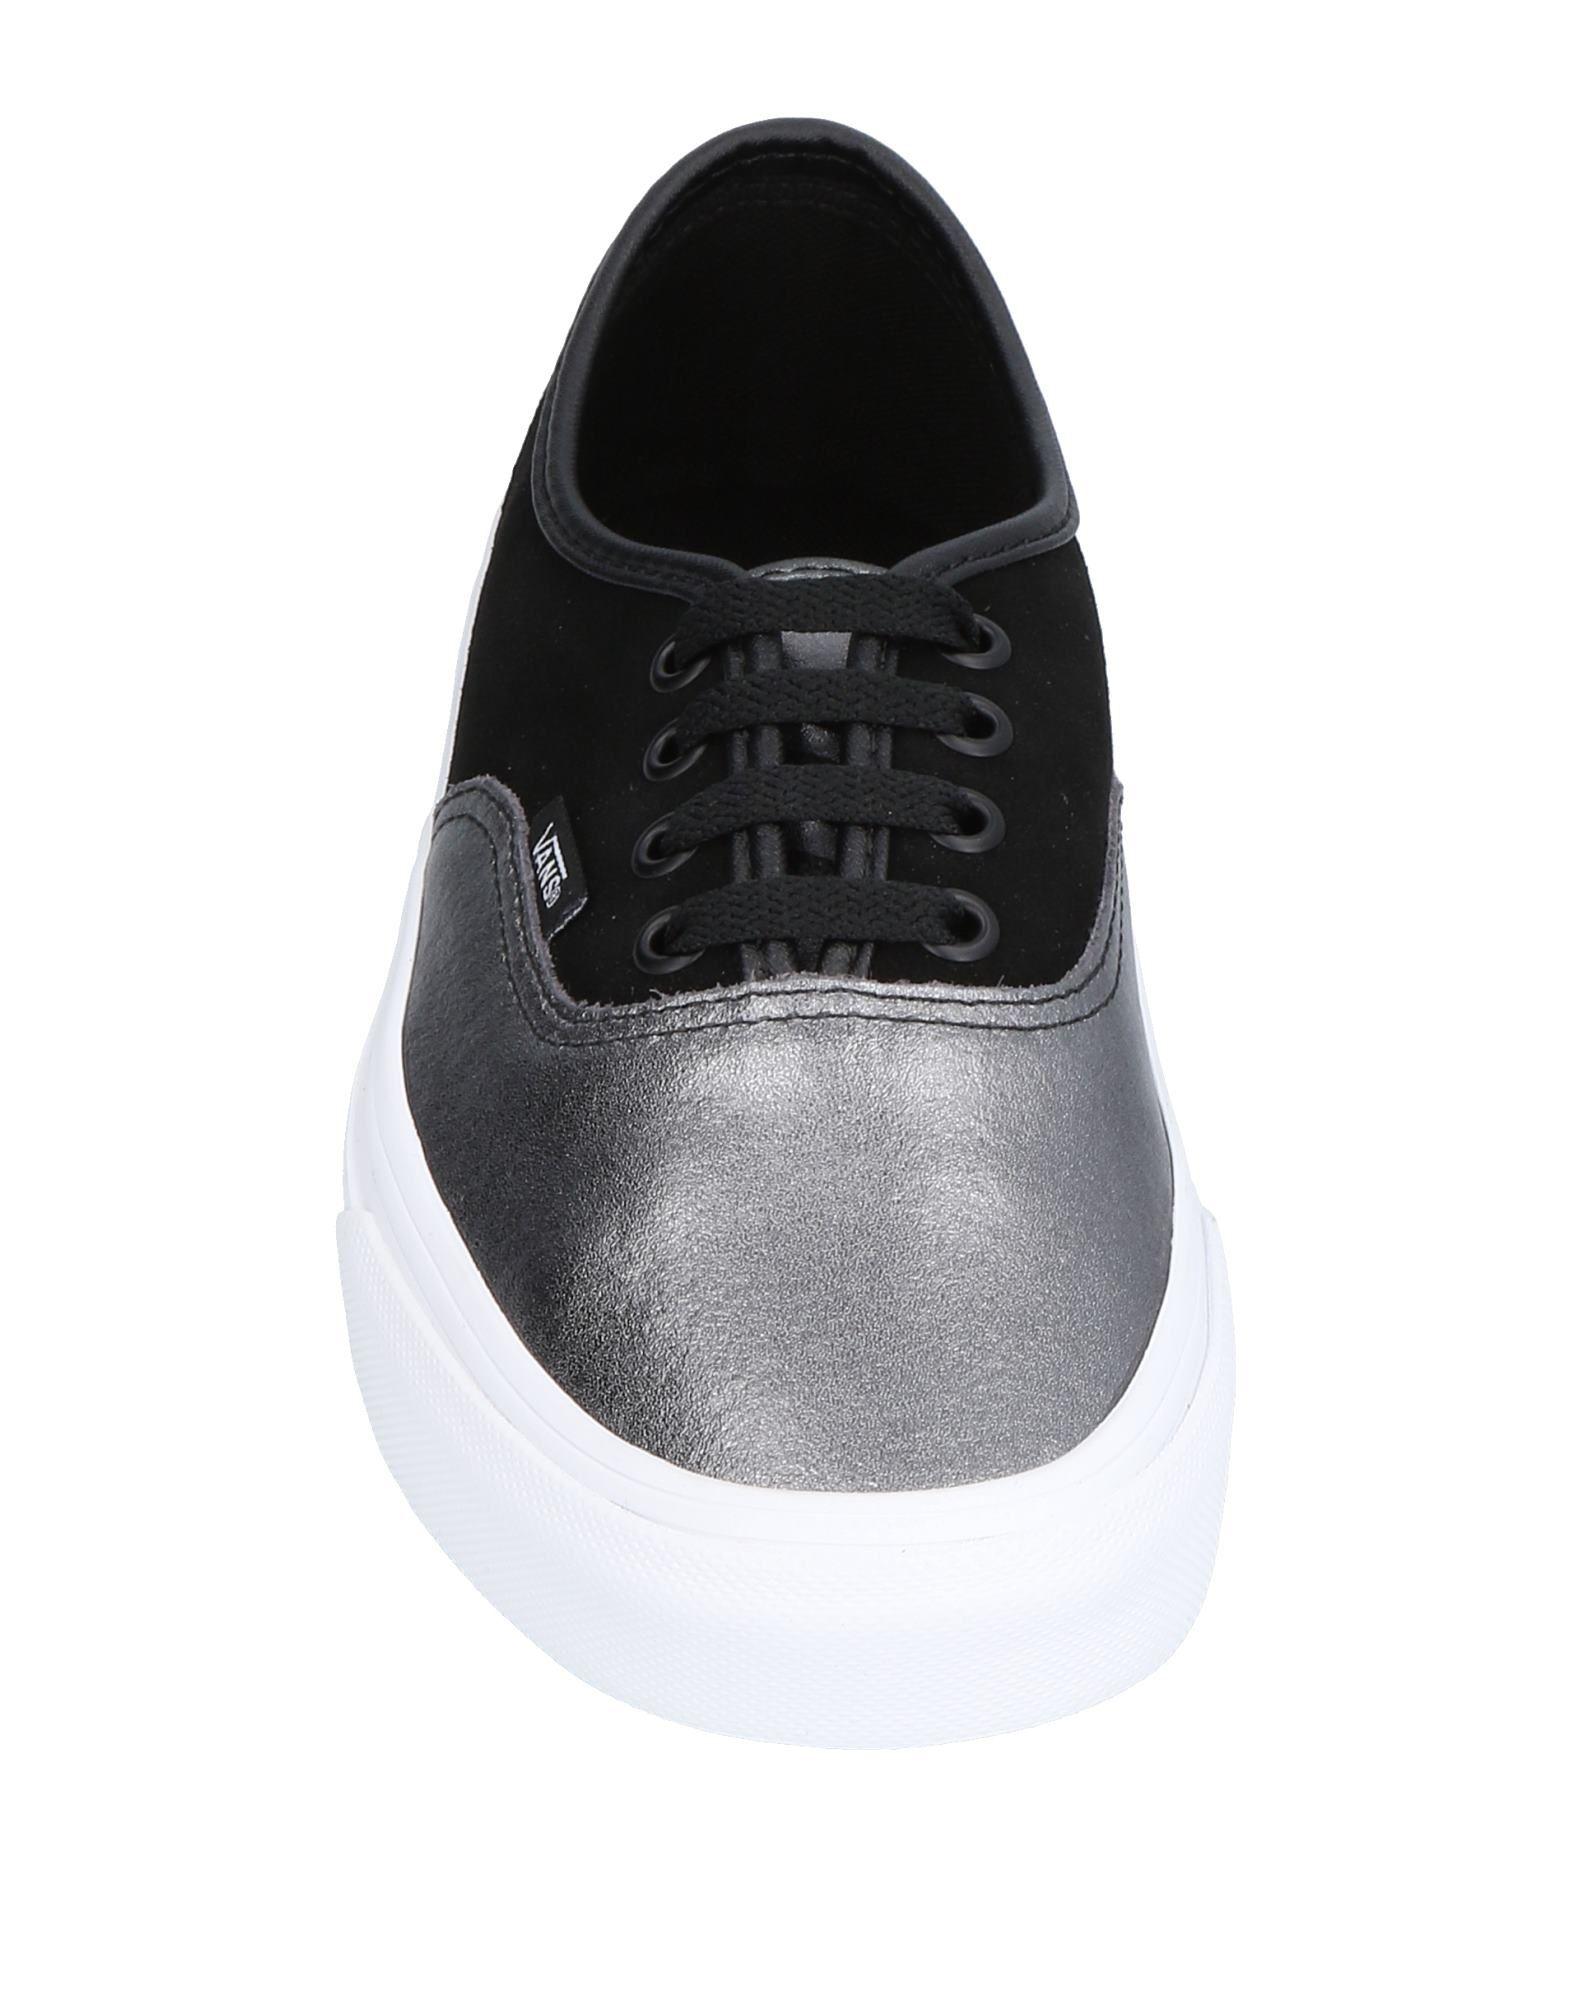 Vans Sneakers Damen Damen Sneakers  11473805MD bbb87f